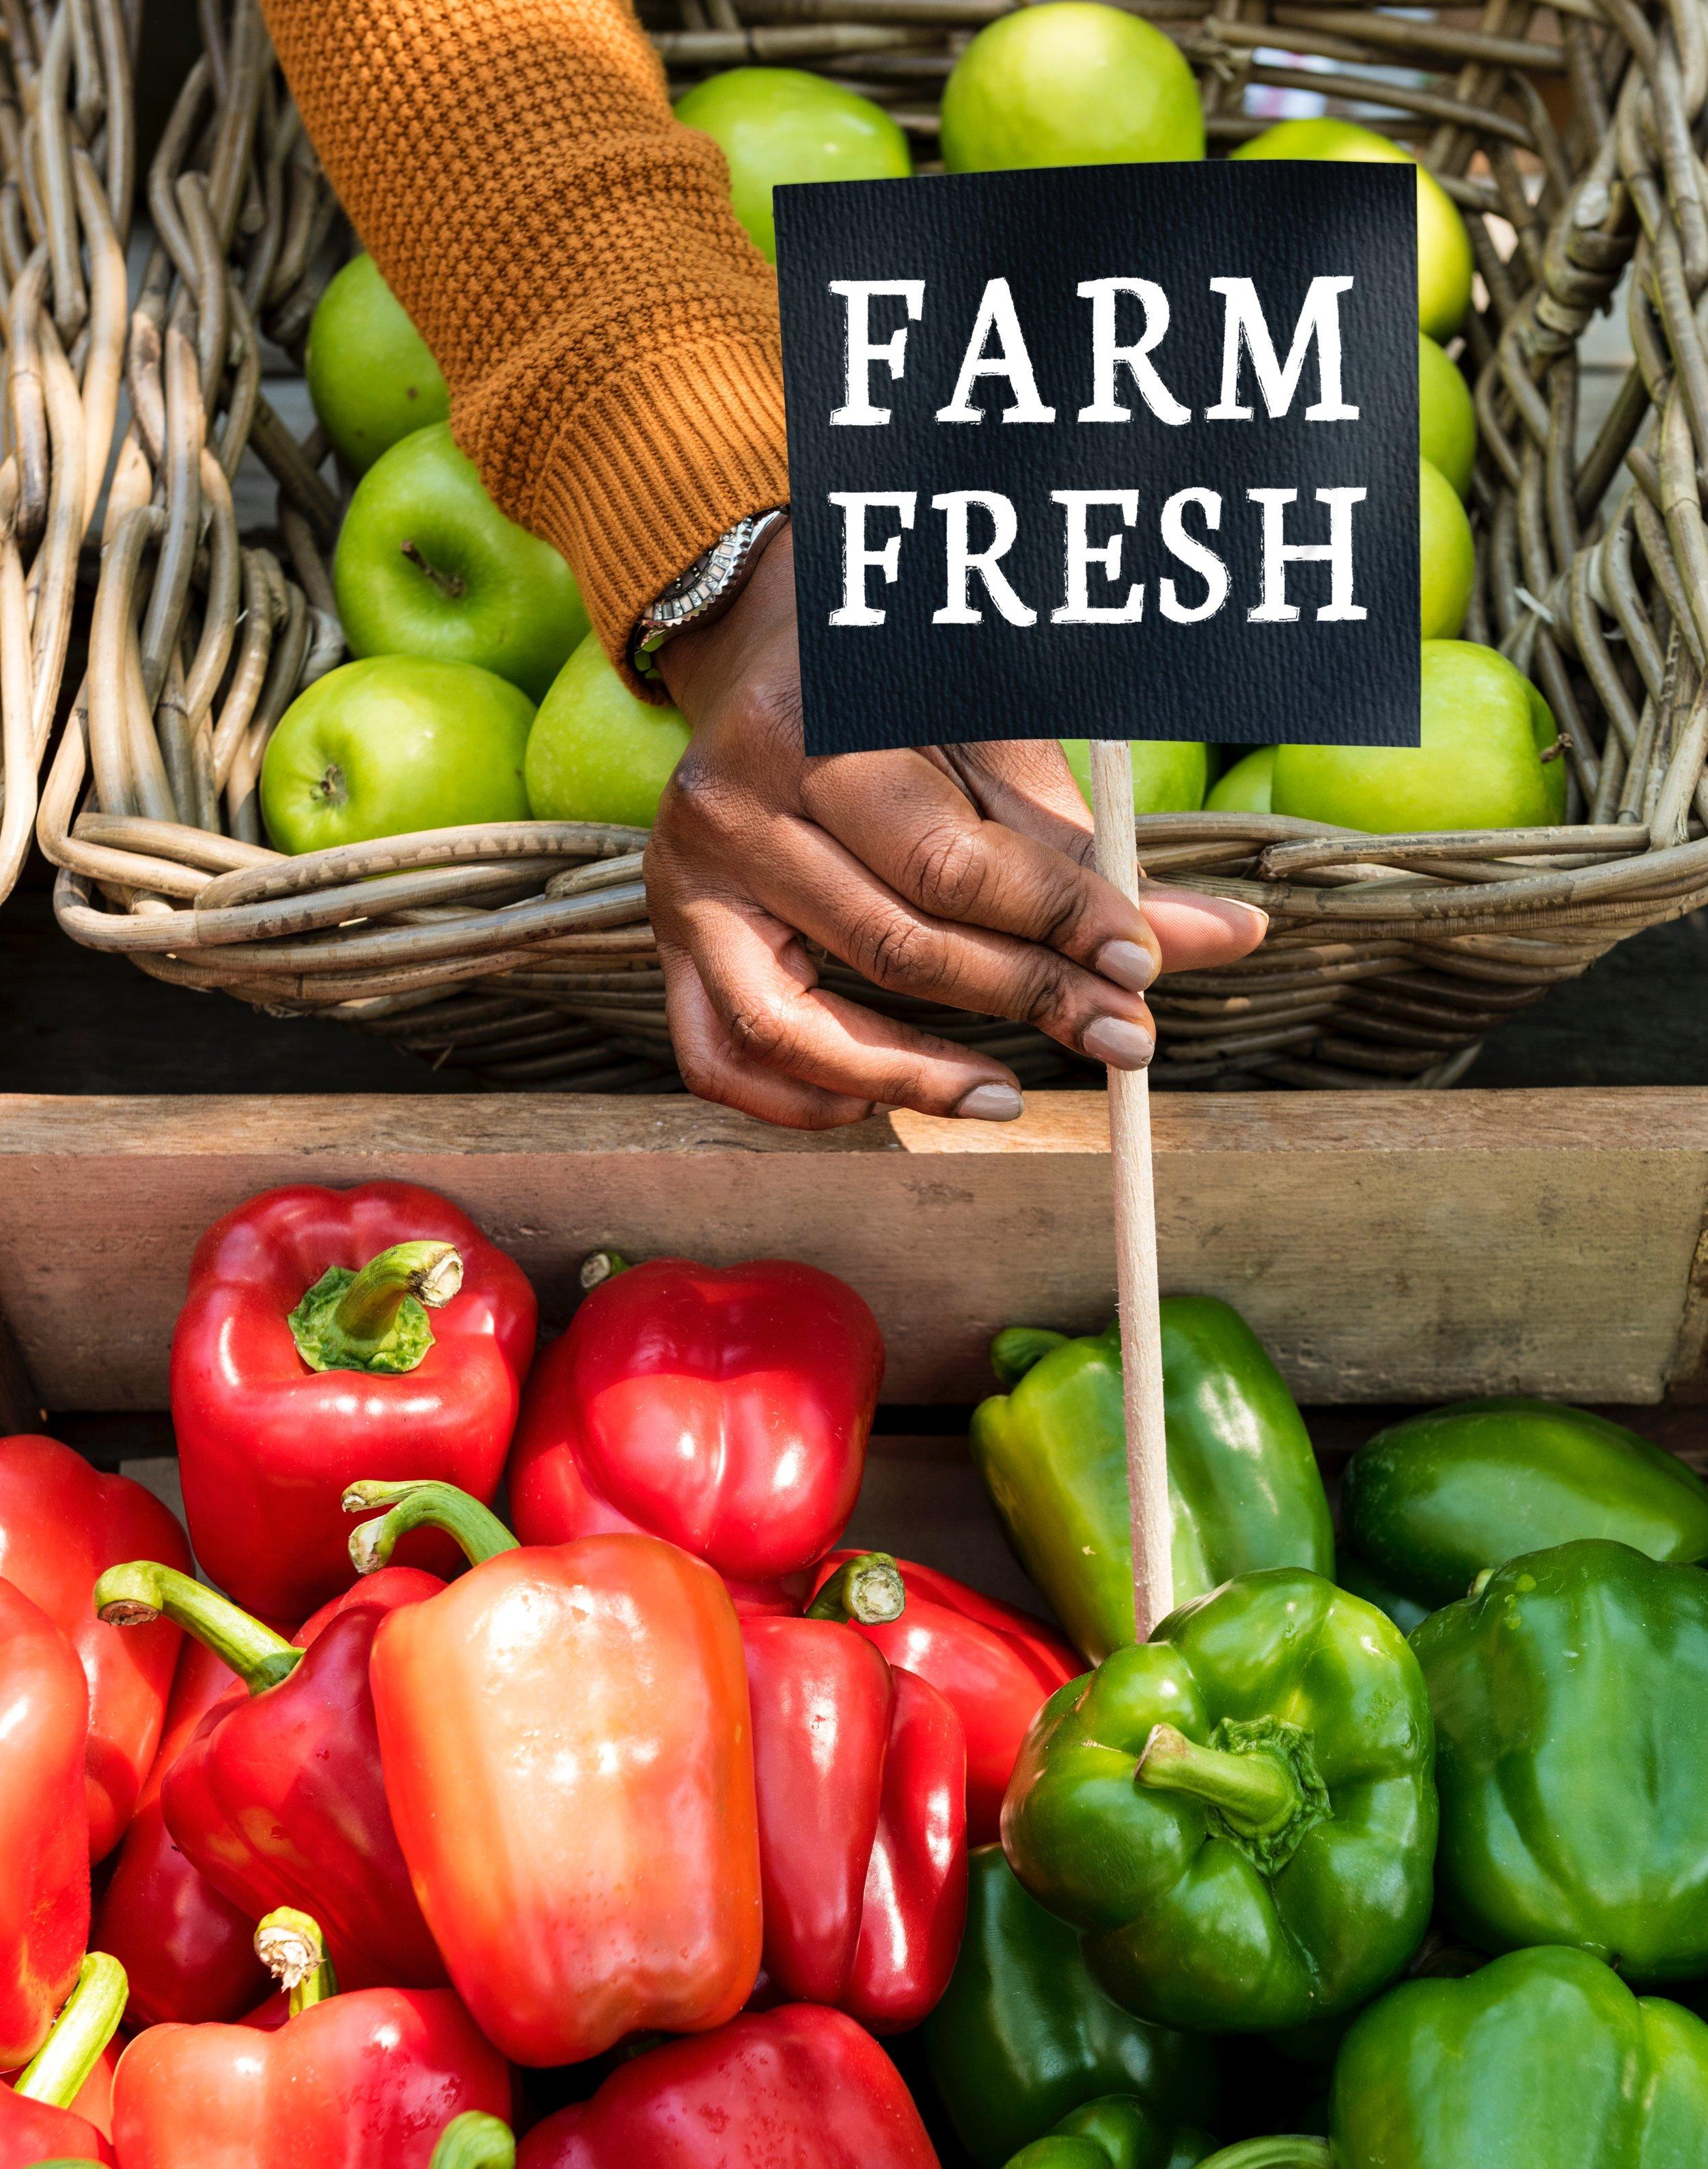 bell-peppers-capsicum-farm-produce-1866037.jpg